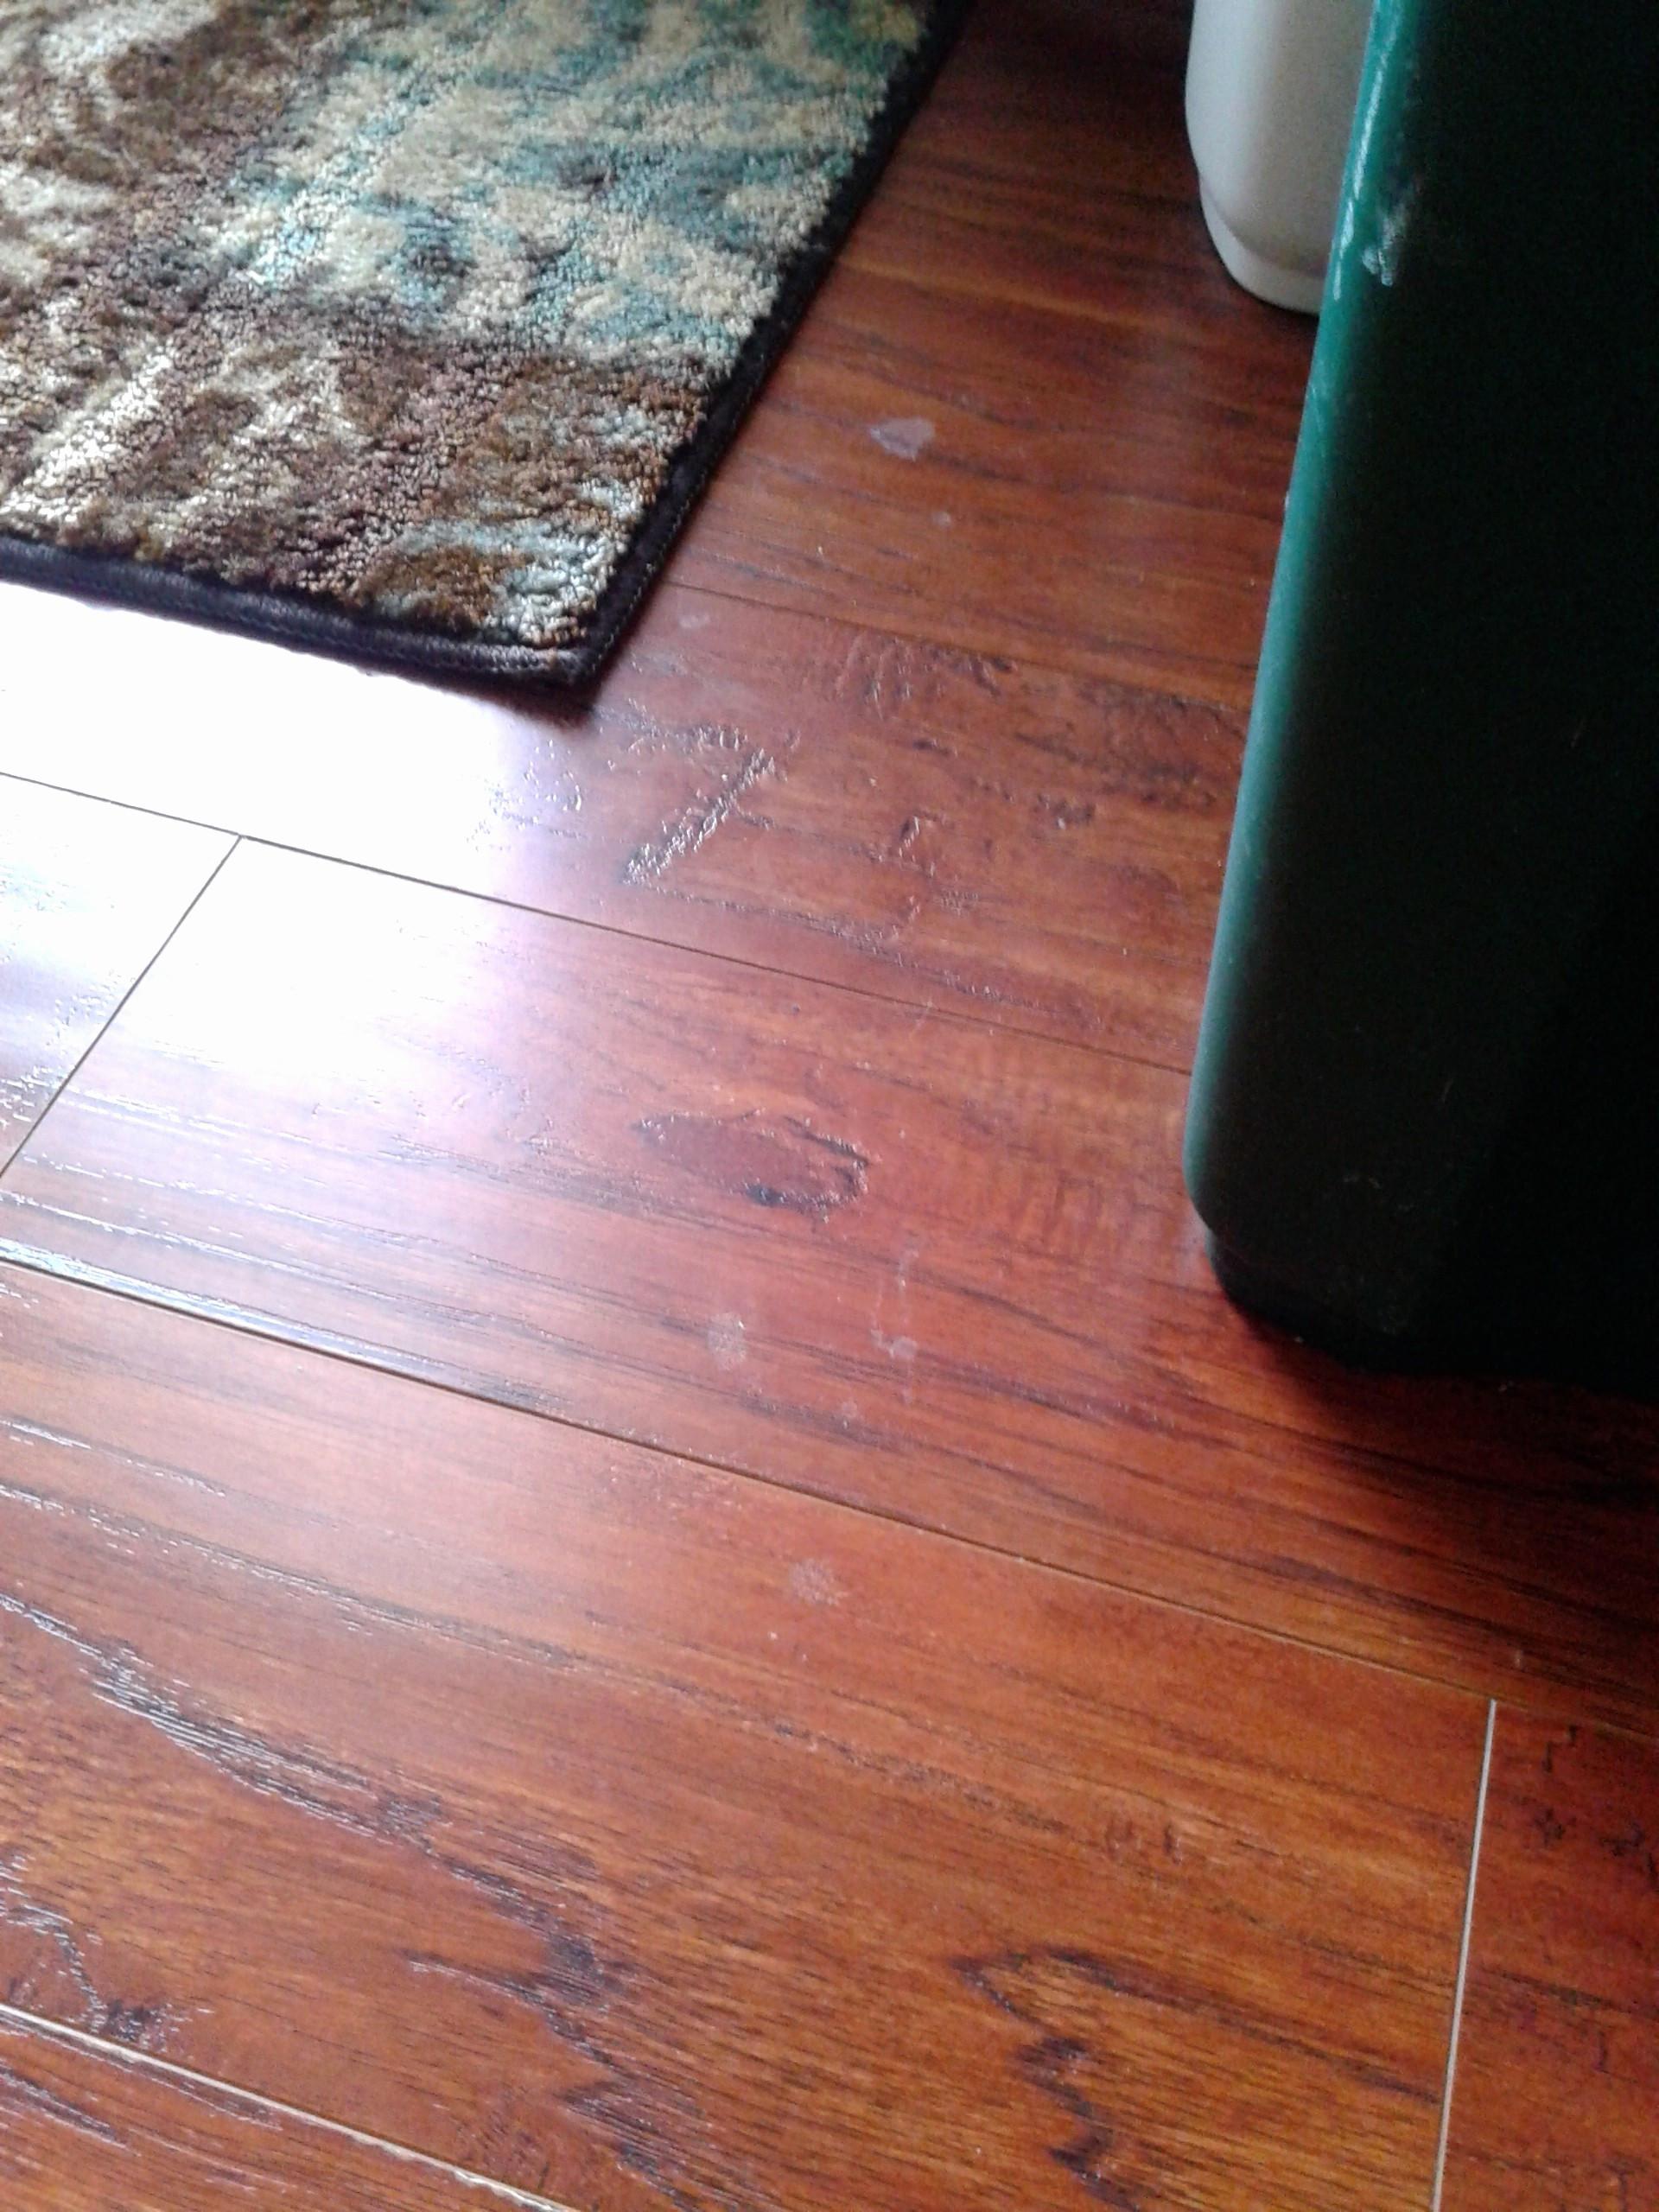 bona professional hardwood floor care system of 46 elegant the best of bona hardwood floor mop laminate mobel pertaining to bona hardwood floor mop laminate beautiful 18 inspirational bona hardwood cleaner s dizpos